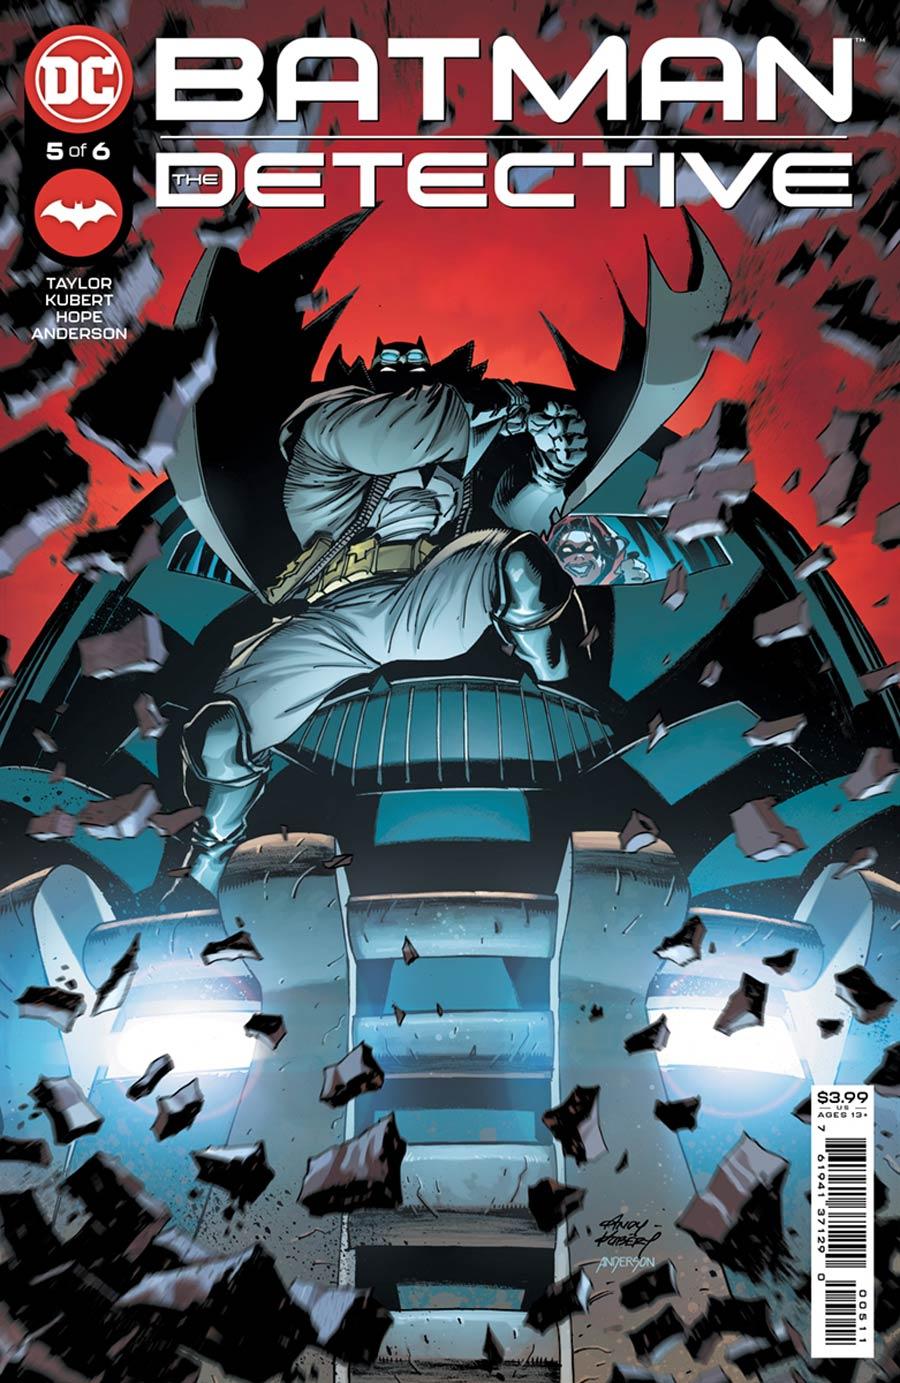 Batman The Detective #5 Cover A Regular Andy Kubert Cover